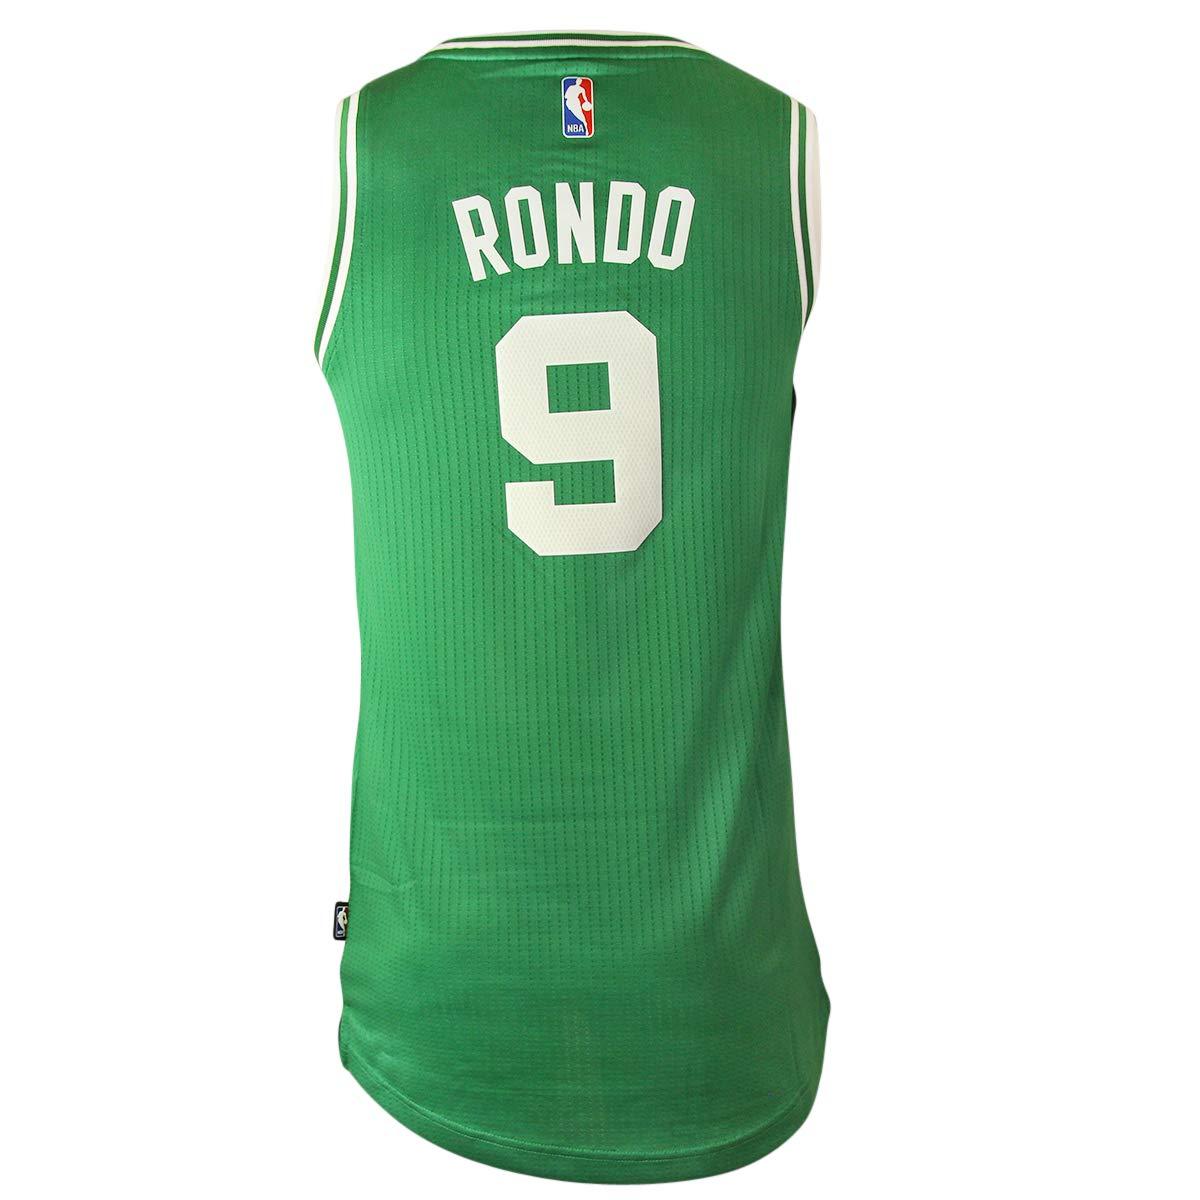 Camiseta Tirantes (Tank Top) adidas - NBA Boston Celtics Int Swingman #9 Verde XS: Amazon.es: Ropa y accesorios